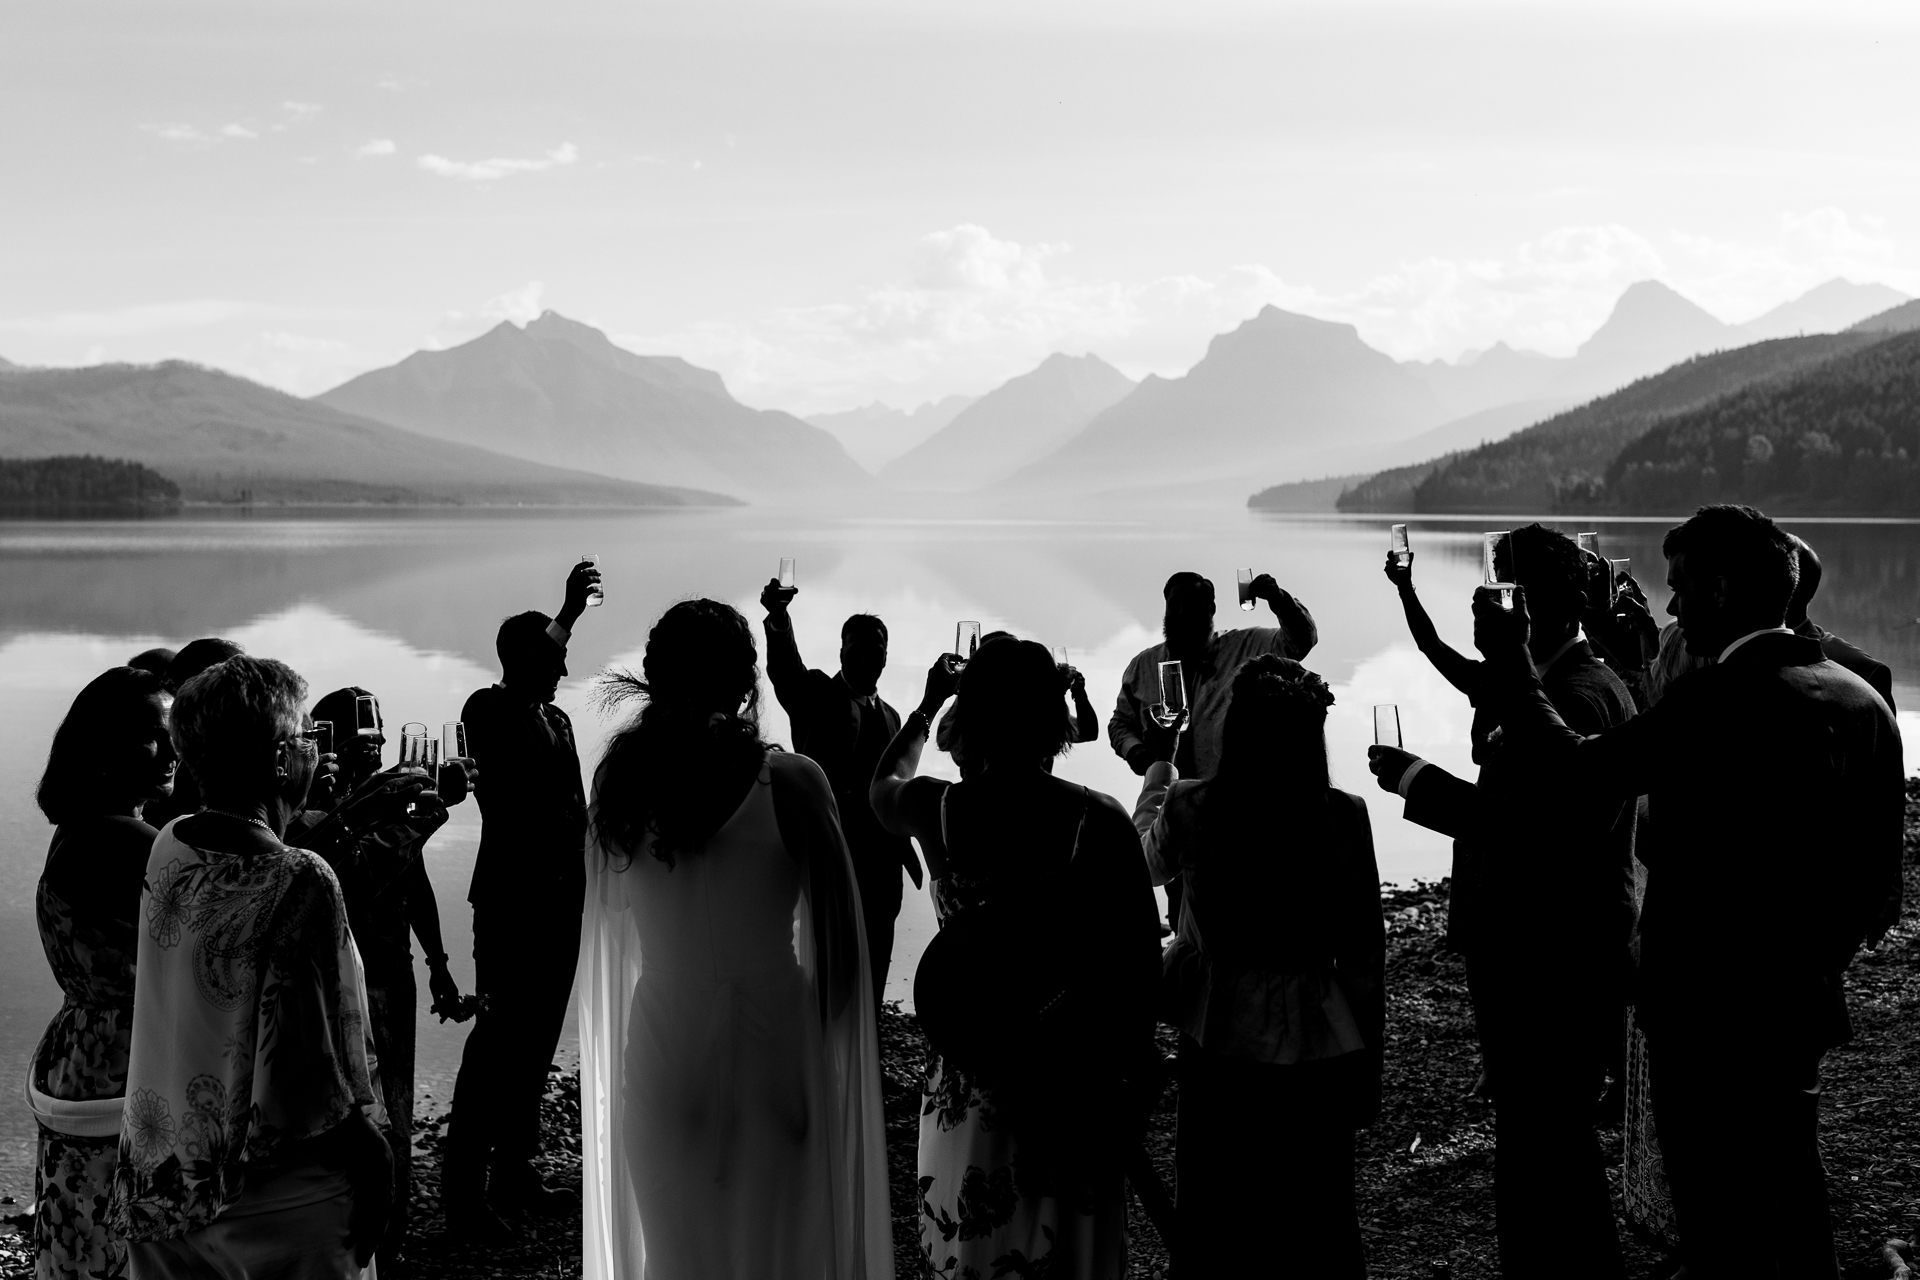 David Clumpner, of Montana, is a wedding photographer for Glacier Park, Montana